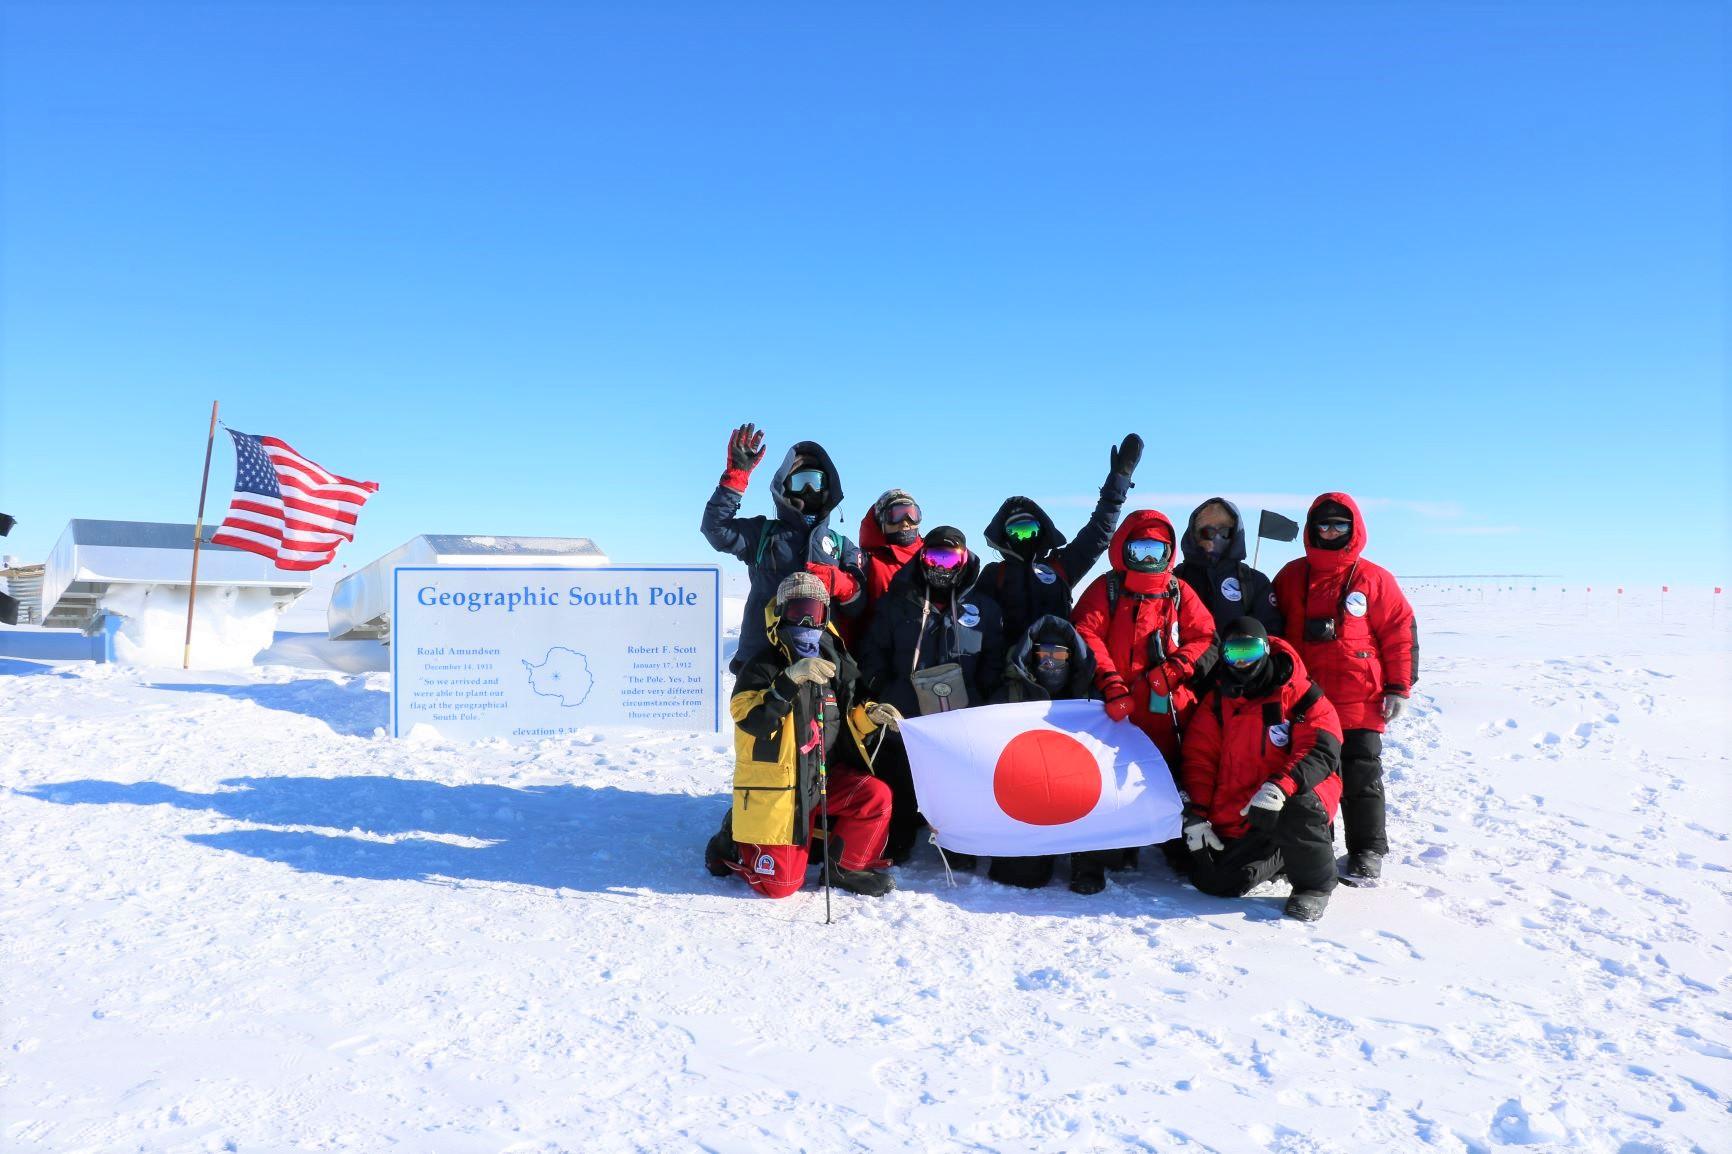 地理学上の南極点で記念撮影